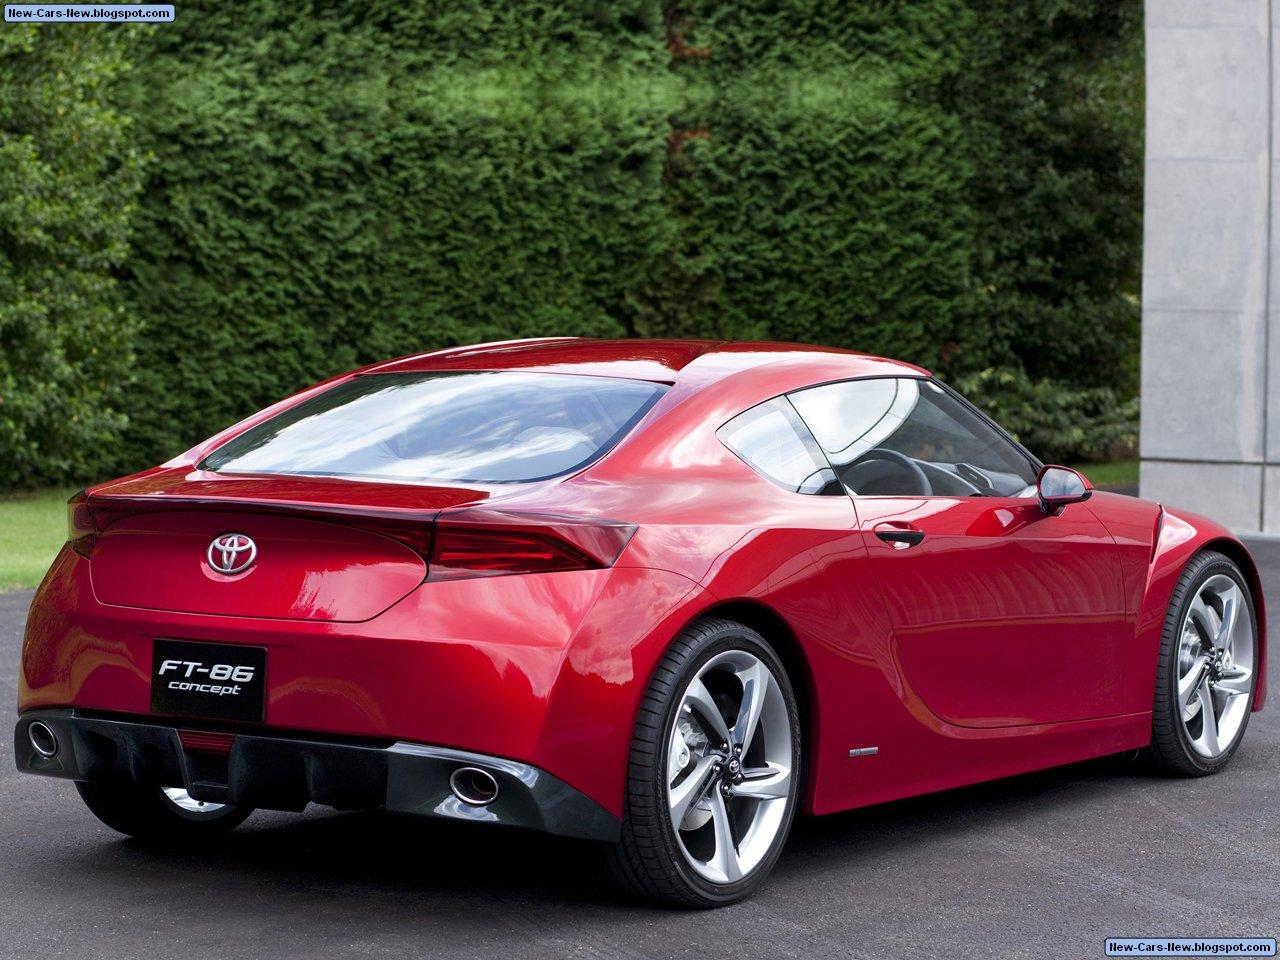 https://3.bp.blogspot.com/_U4w592tUDHM/TB3lwo3VliI/AAAAAAAAAok/6scX0UwAsLw/s1600/Toyota-FT-86_Concept_2009_1280x960_wallpaper_04.jpg